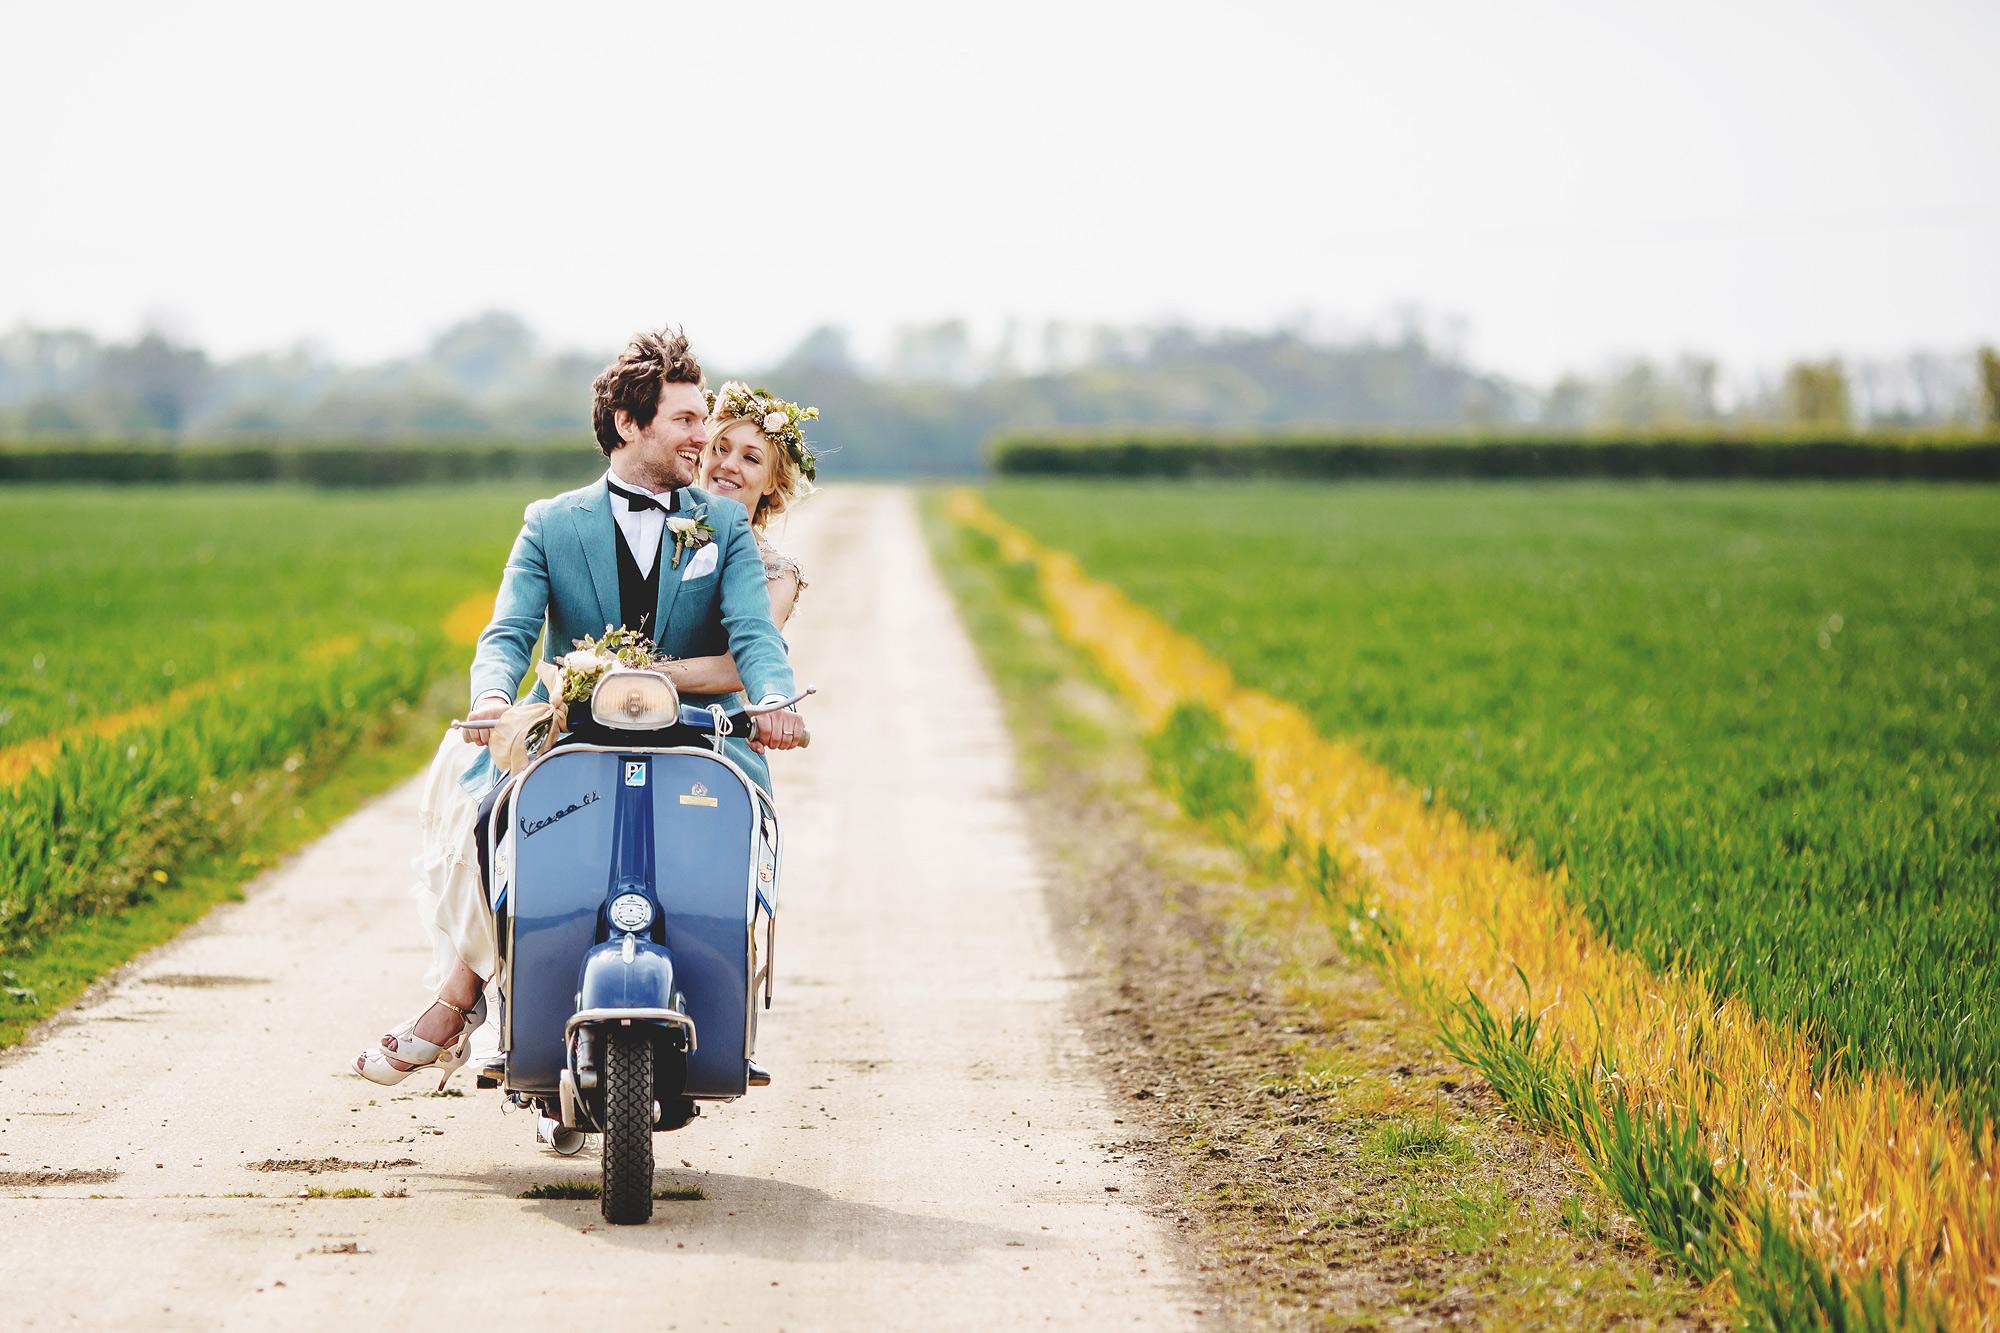 just-married-couple-on-blue-vespa-groom-in-teal-suit-bride-wearing-floral-crown-worlds-best-wedding-photos-ross-harvey-london-wedding-photographers